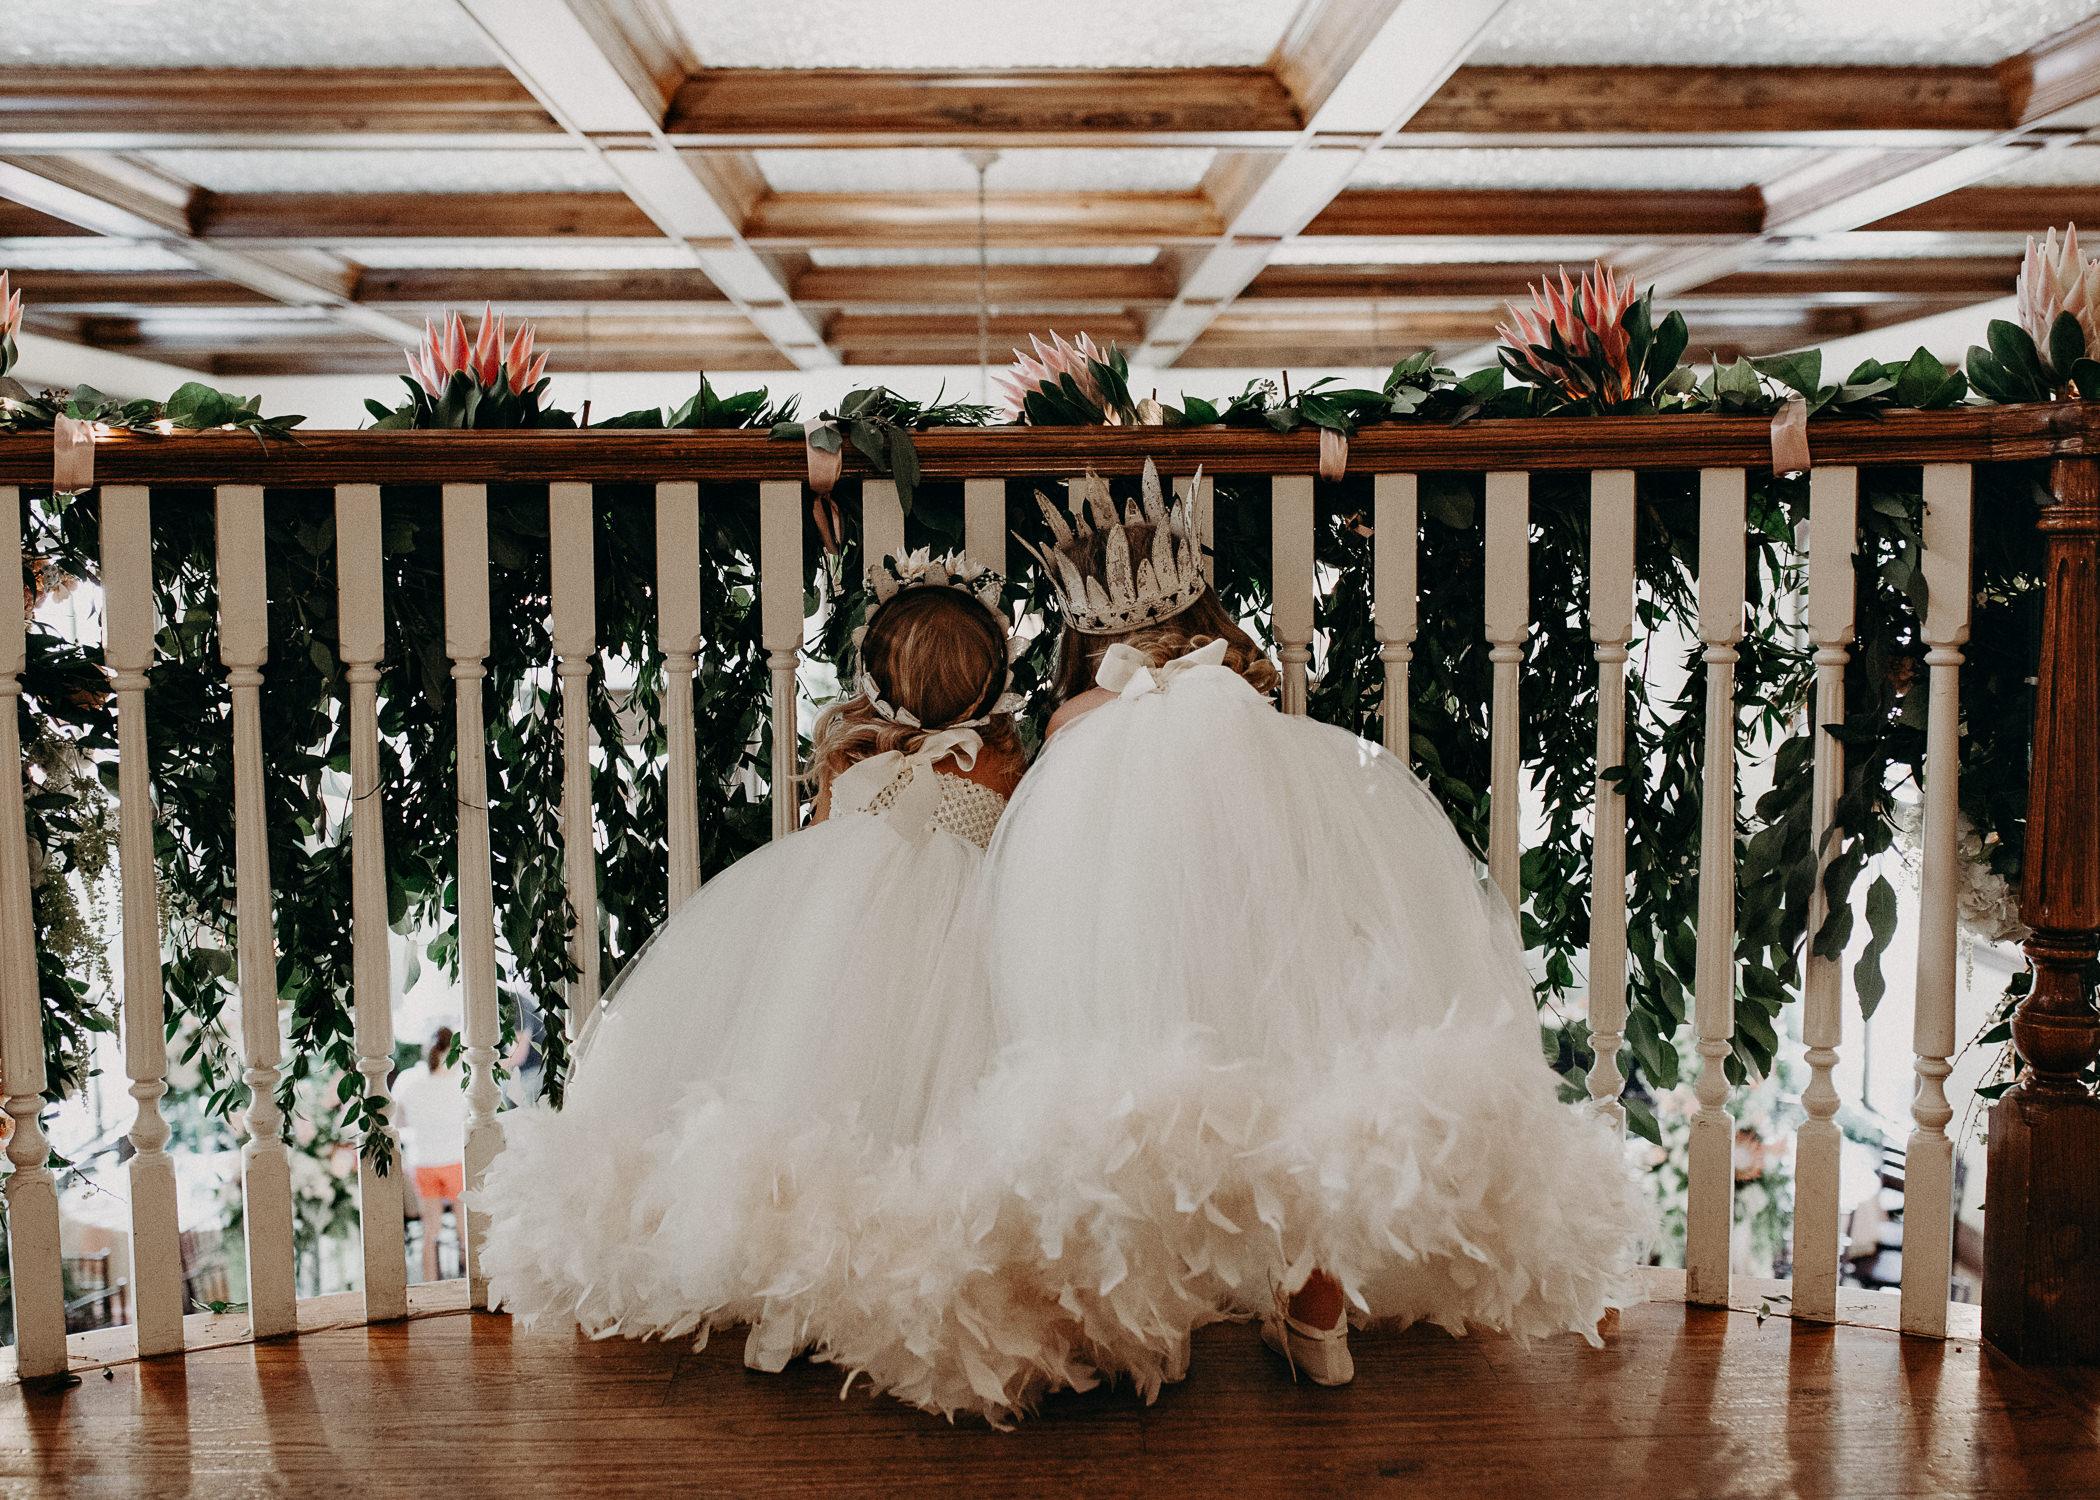 30Carl House Wedding Venue Ga, Atlanta Wedding Photographer - Boho, Bohemian, Junebug Weddings, Vintage, Retro, Trendy. Aline Marin Photography. .jpg